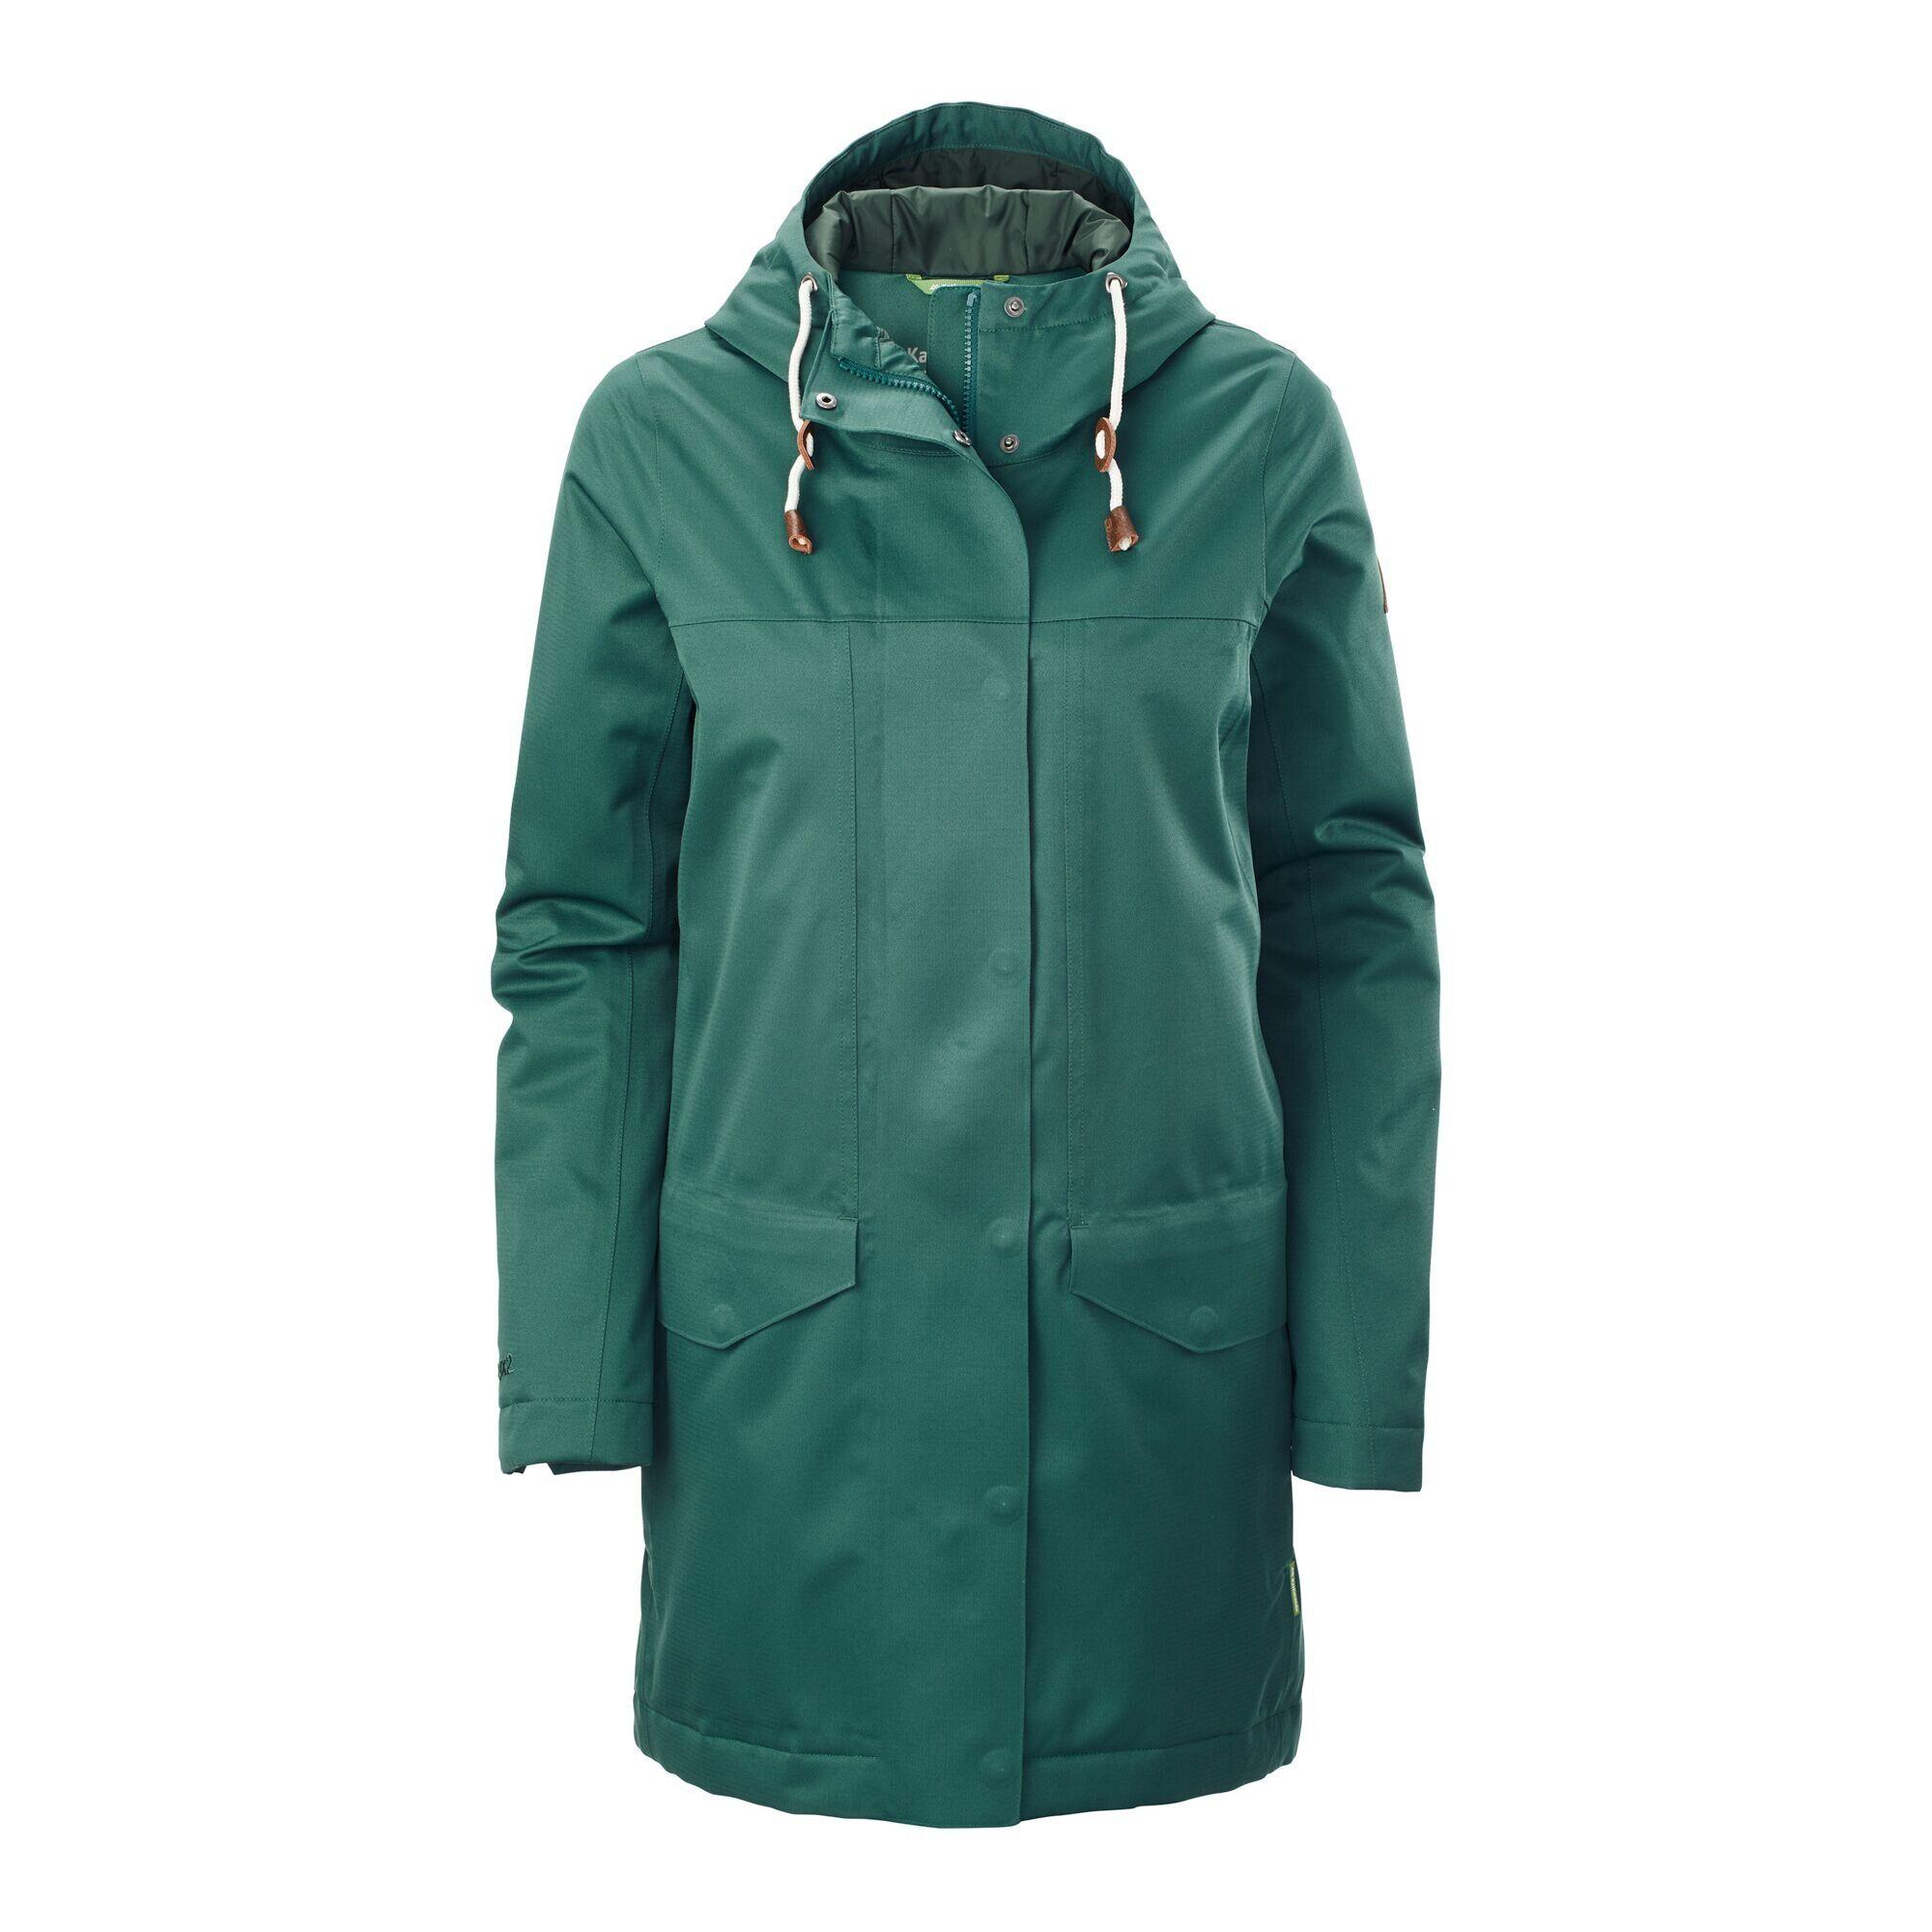 Kathmandu Stockton Women's Rain Jacket  - Pine - Size: US 2